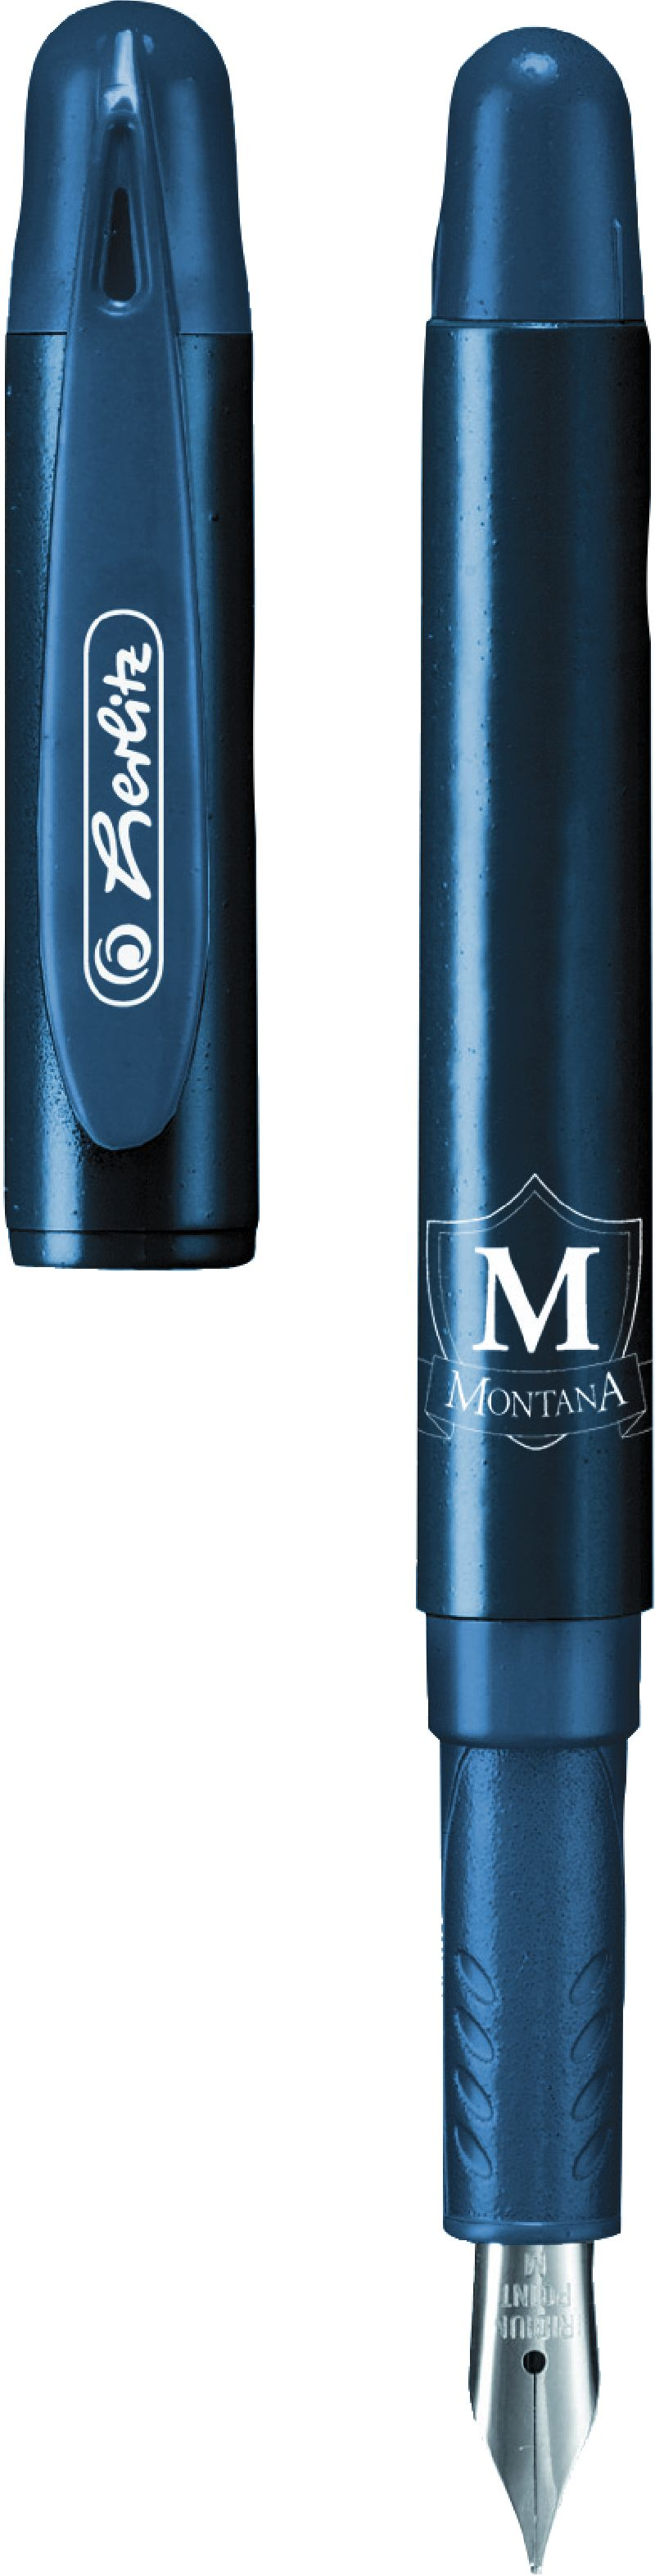 zzStilou Montana albas tru